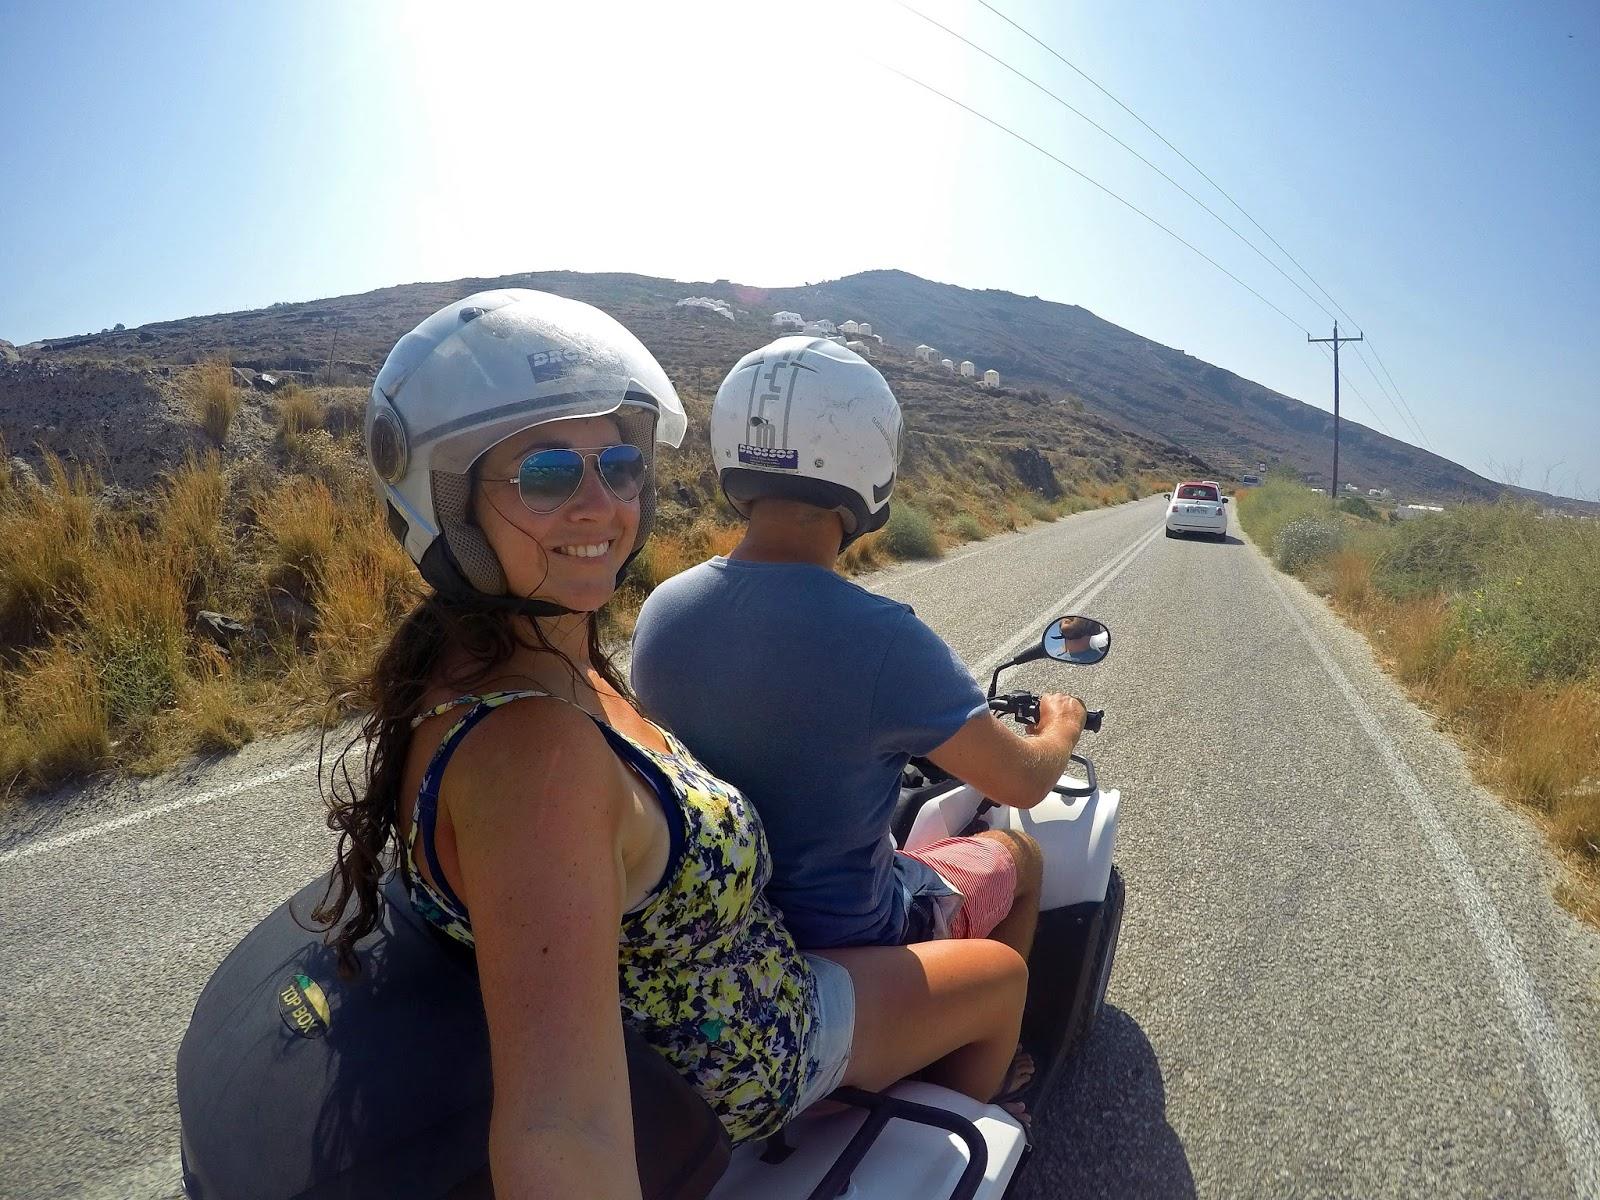 Couple on Quad biking around Santorini